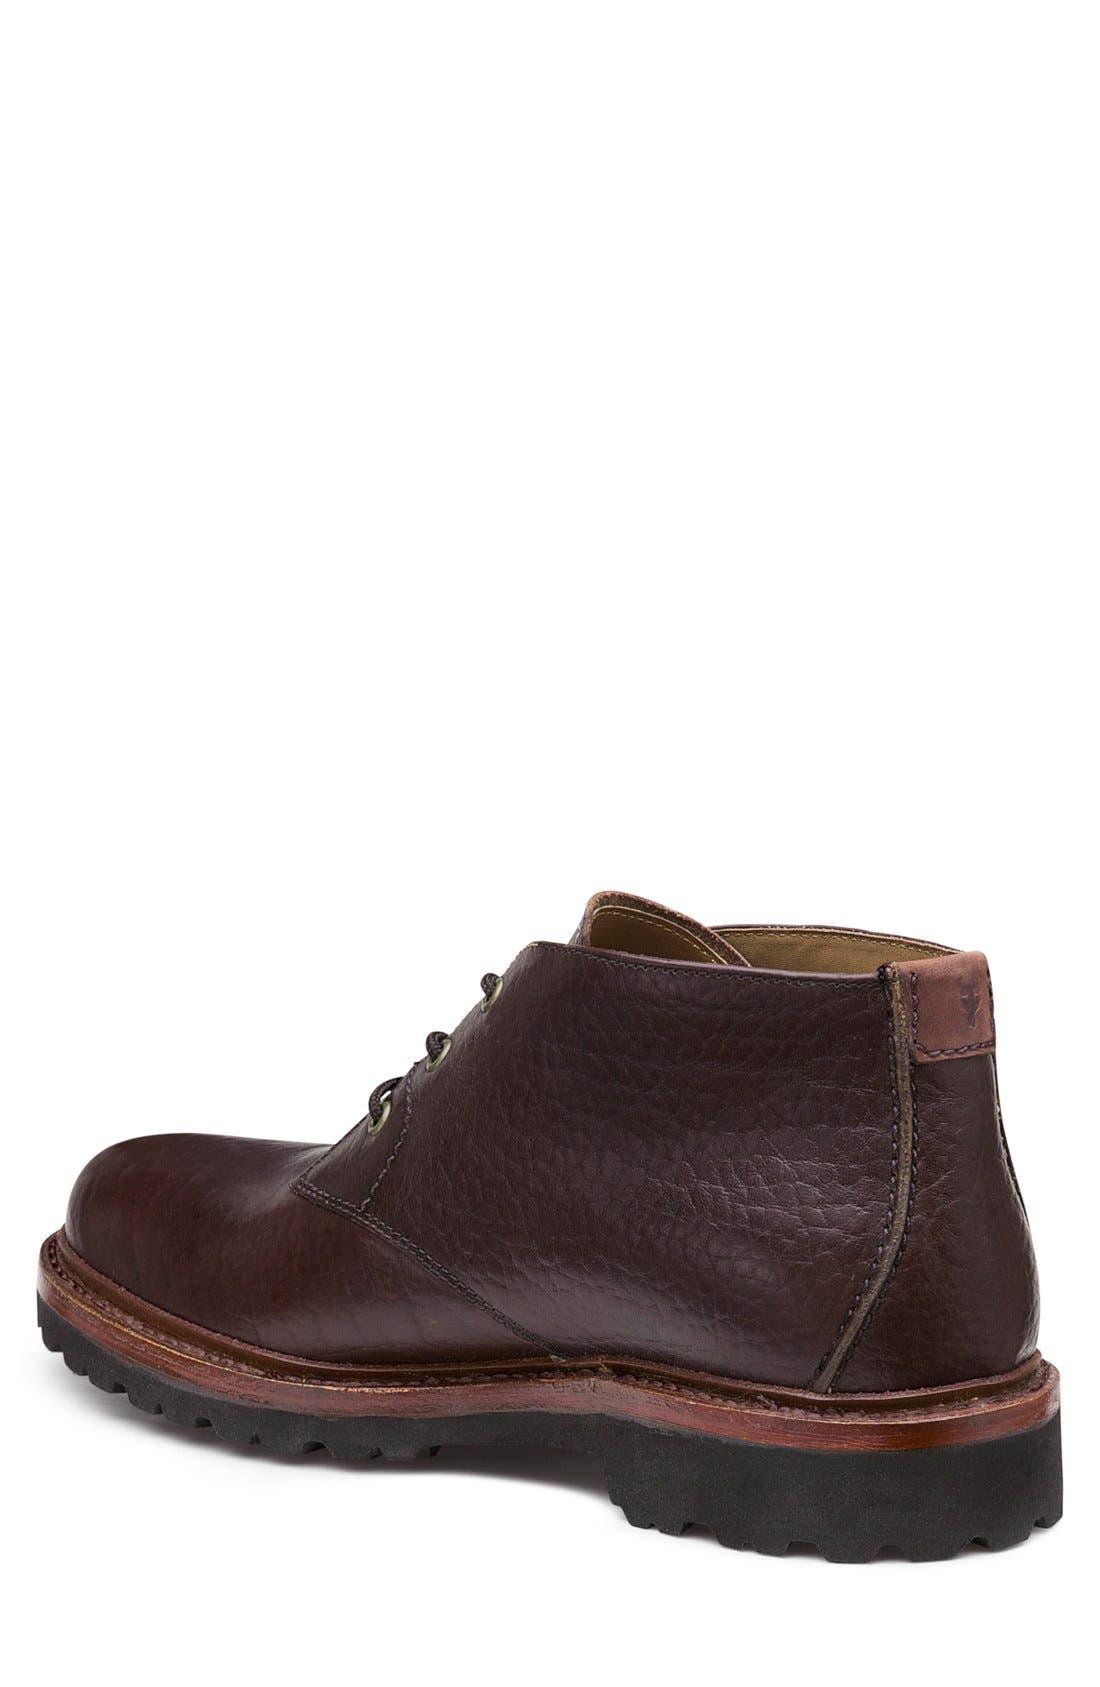 'Gulch II' Chukka Boot,                             Alternate thumbnail 2, color,                             Bourbon Leather